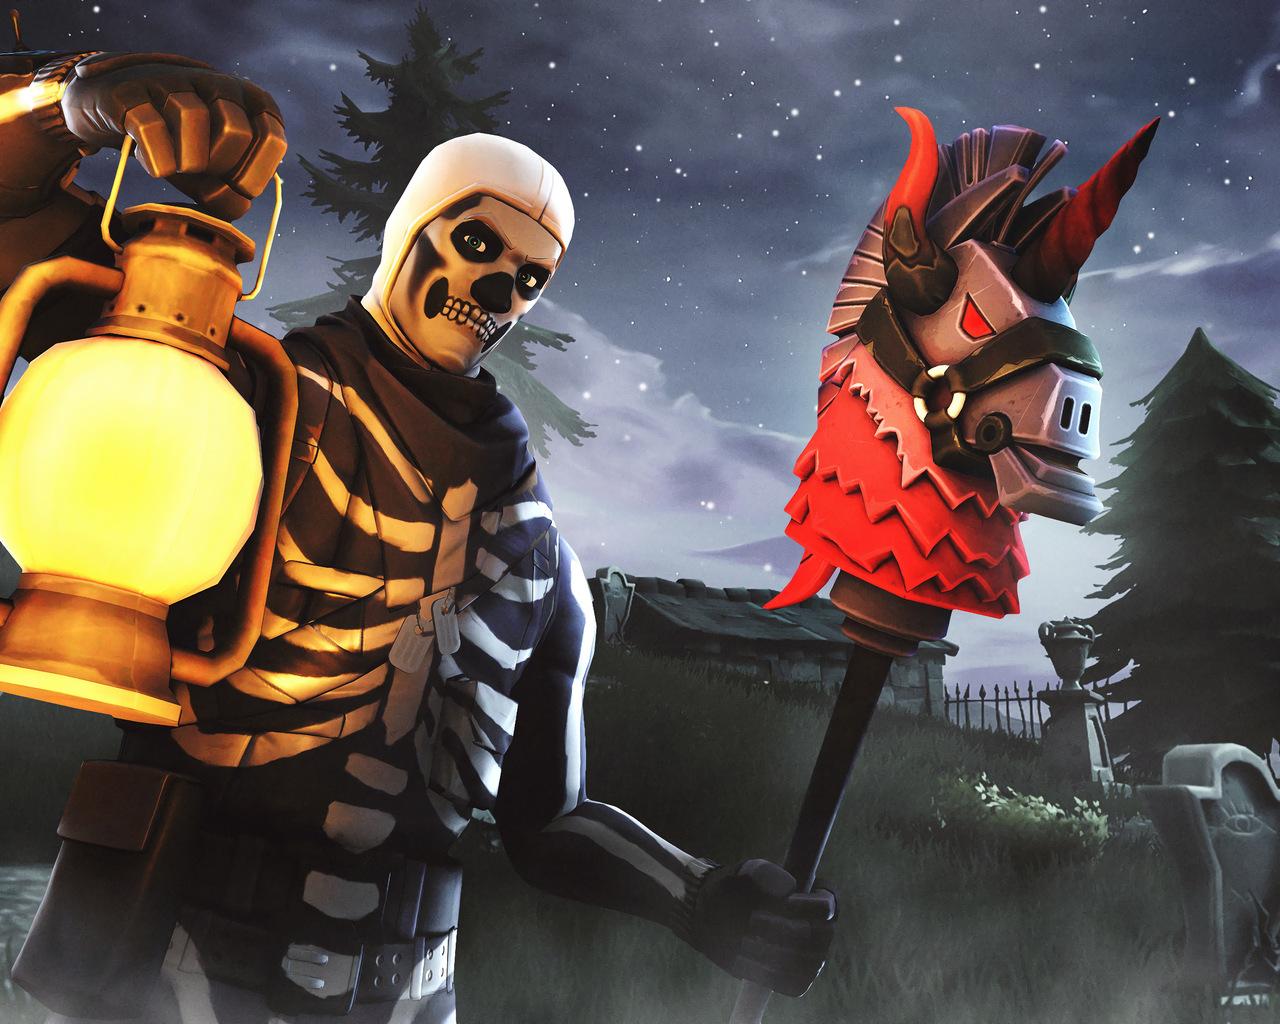 1280x1024 Skull Trooper Fortnite Season 6 4K 1280x1024 Resolution 1280x1024